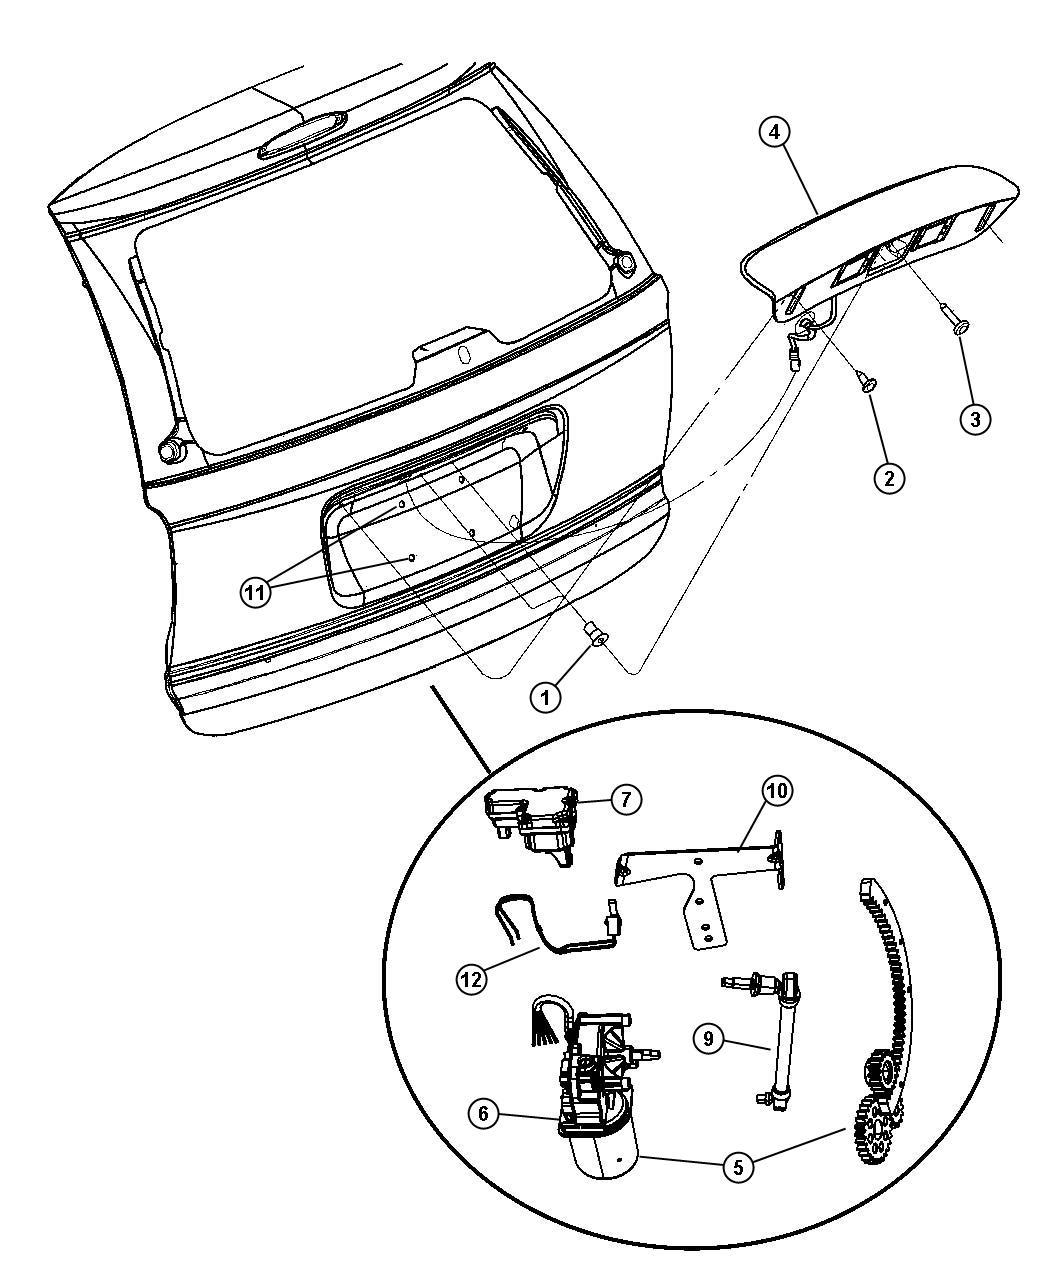 Dodge Durango Actuator Power Latch Engage Actuator